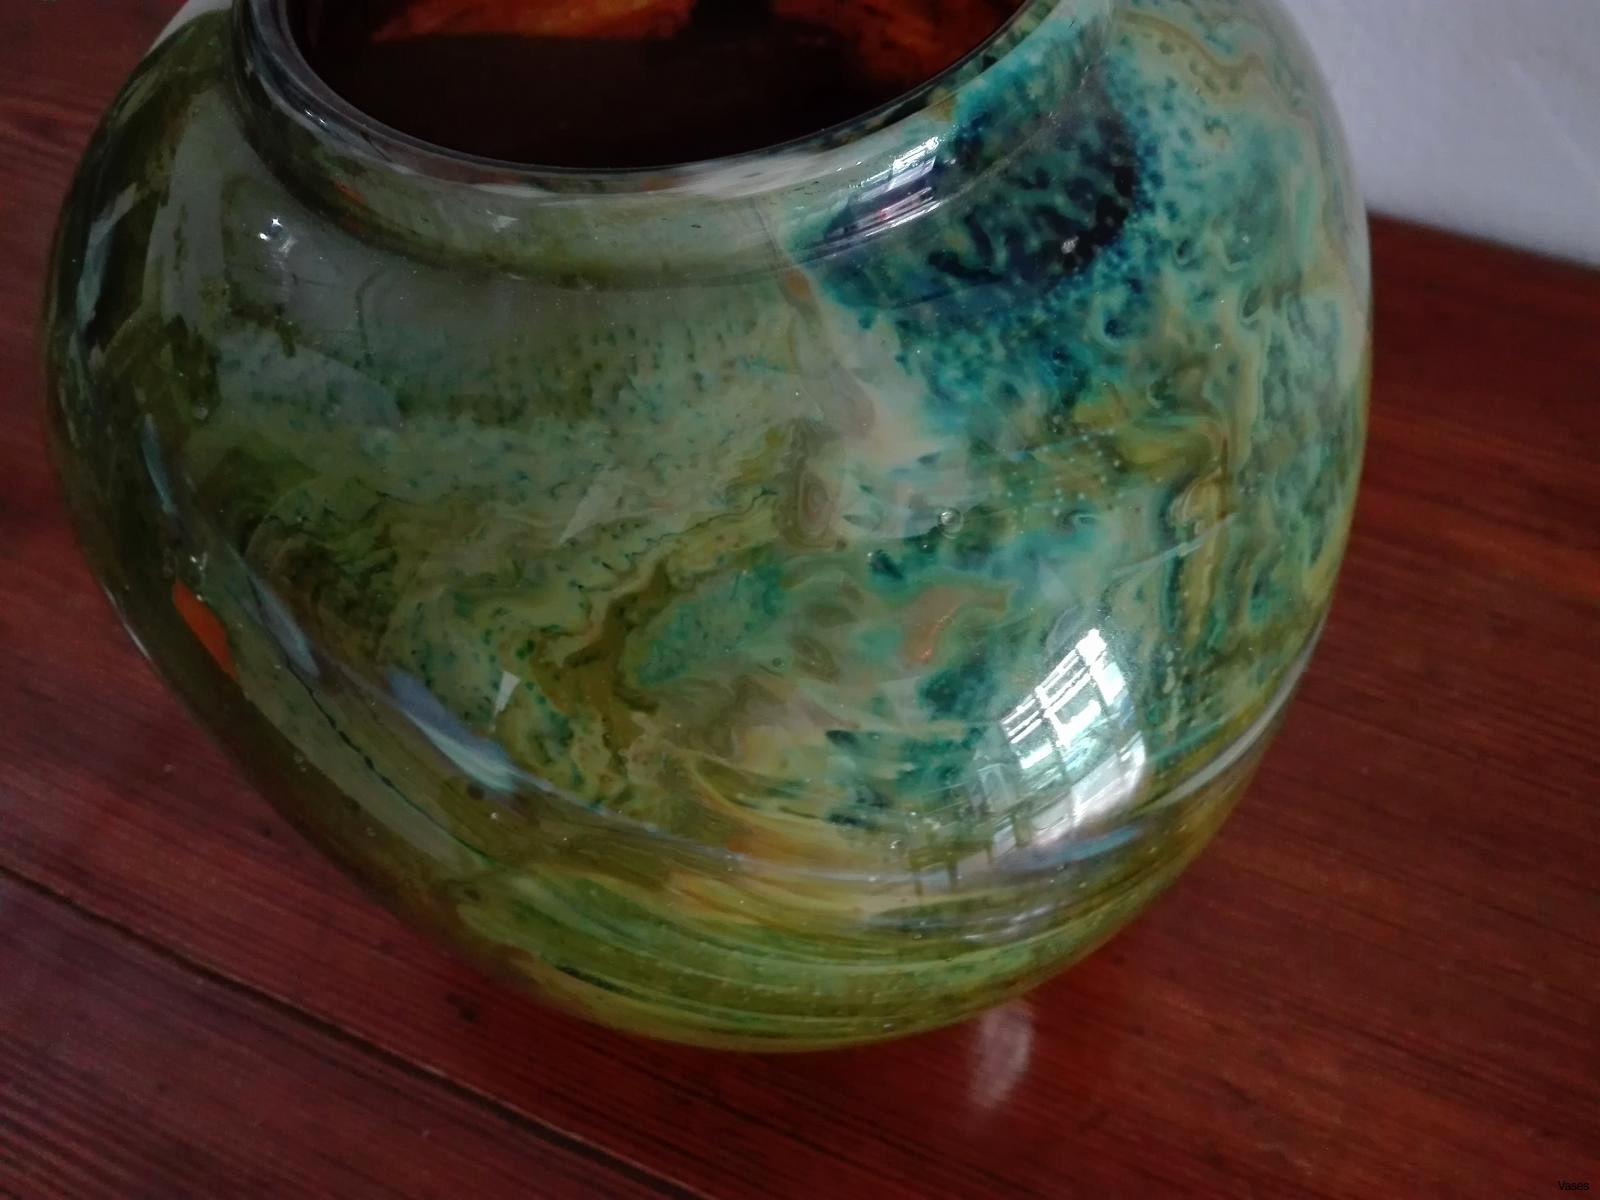 lalique vases images of 18 best of murano glass vase bogekompresorturkiye com throughout murano glas vasen luxus vintage murano glass vases set 2 1h vase price i 0d prices